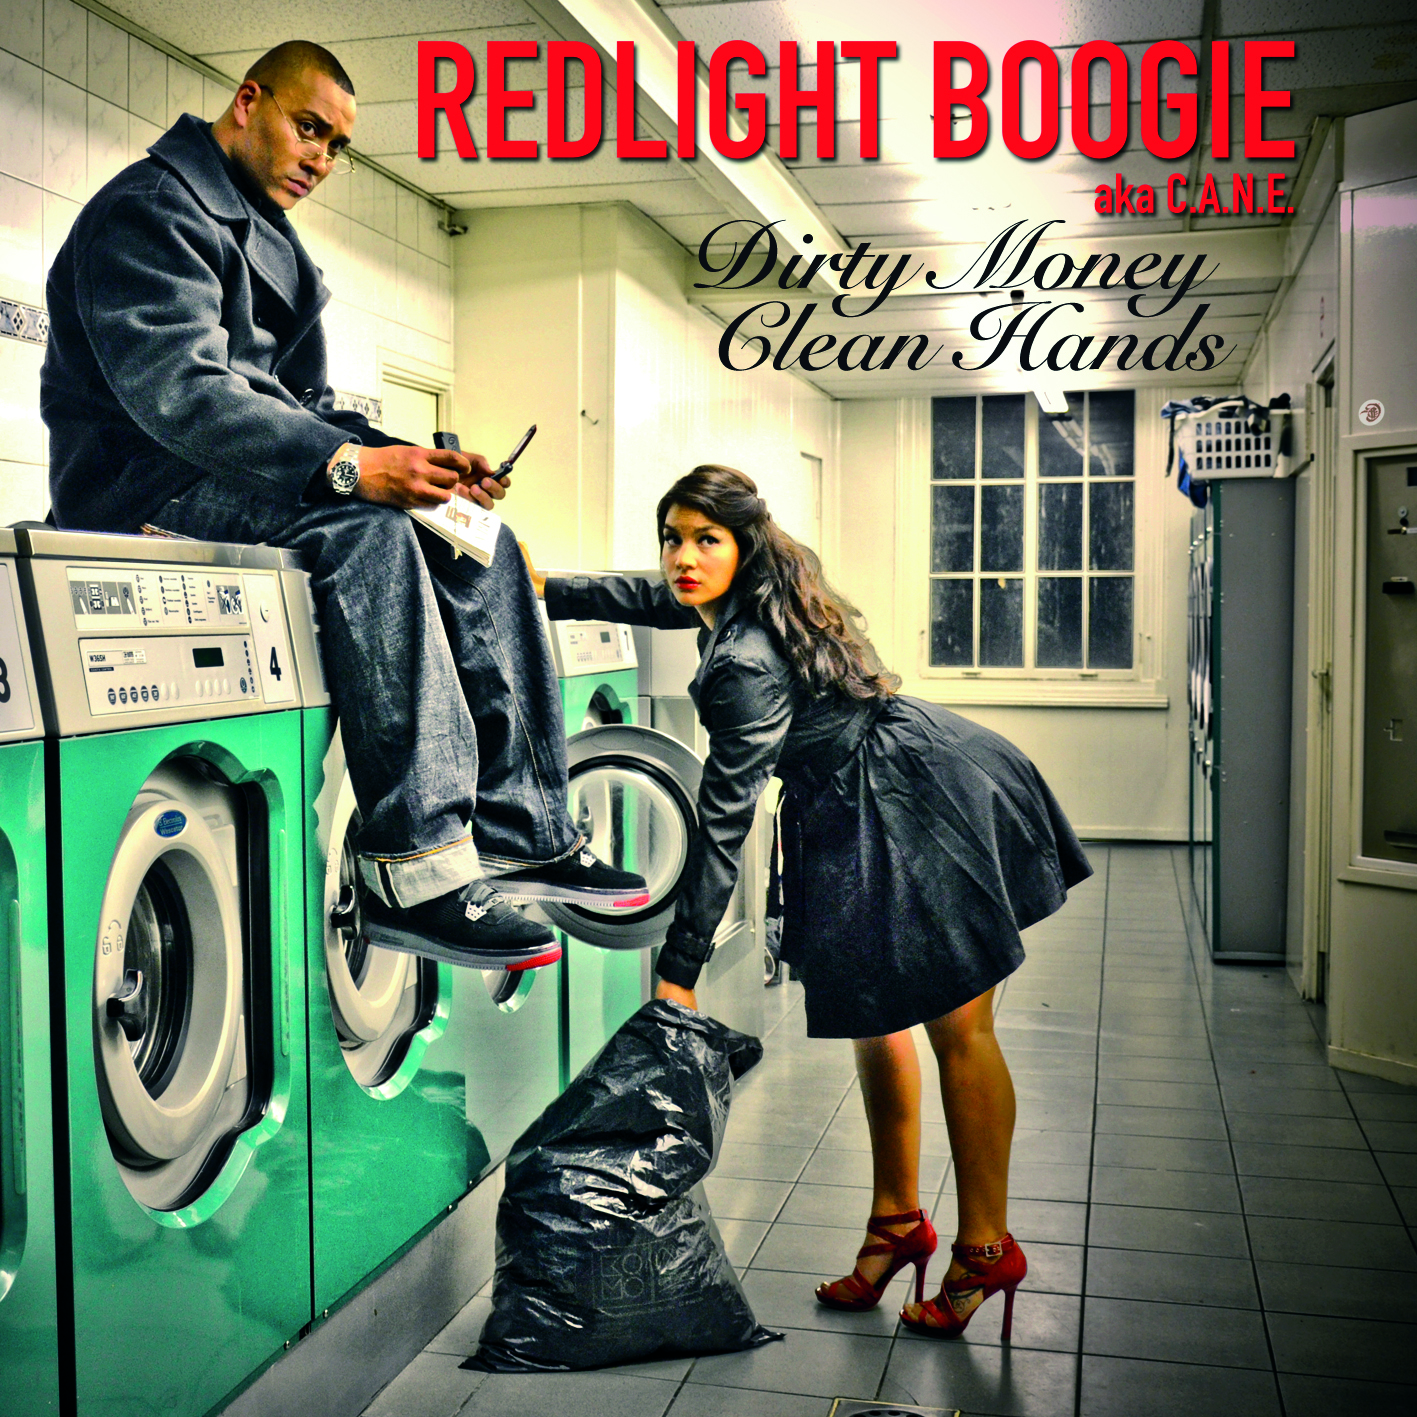 RedlightBoogie_DirtyMoneyCleanHands_120x120_Cover.jpg